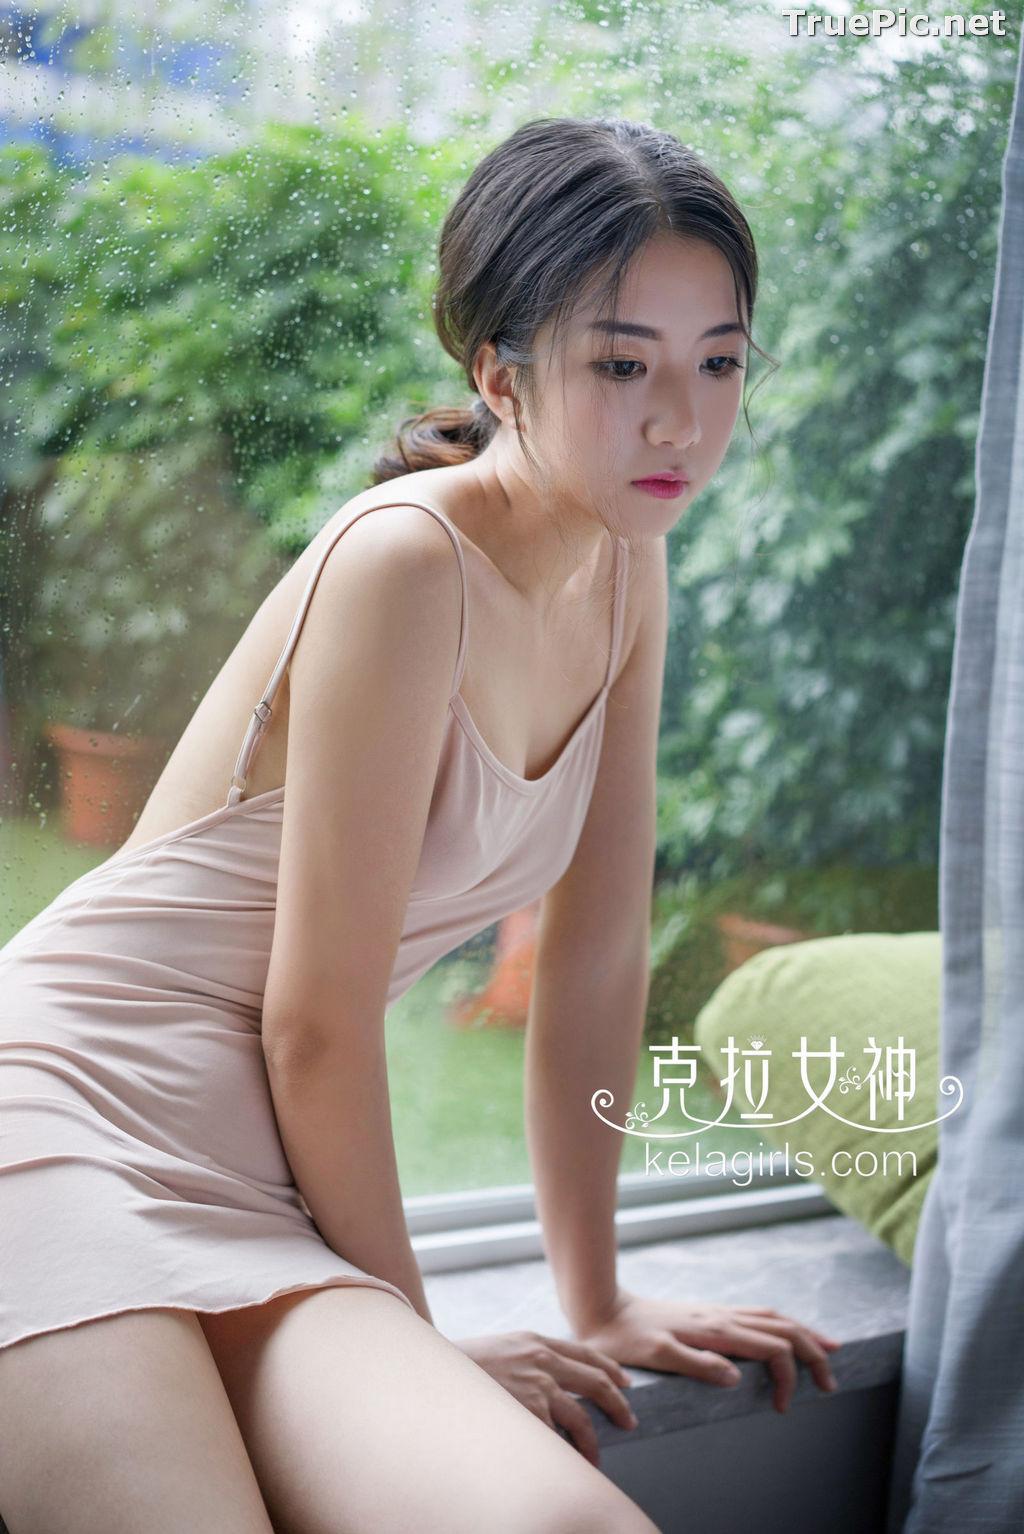 Image KelaGirls 克拉女神 – Chinese Model Ning Ning – Home School Girl Photo Album - TruePic.net - Picture-3